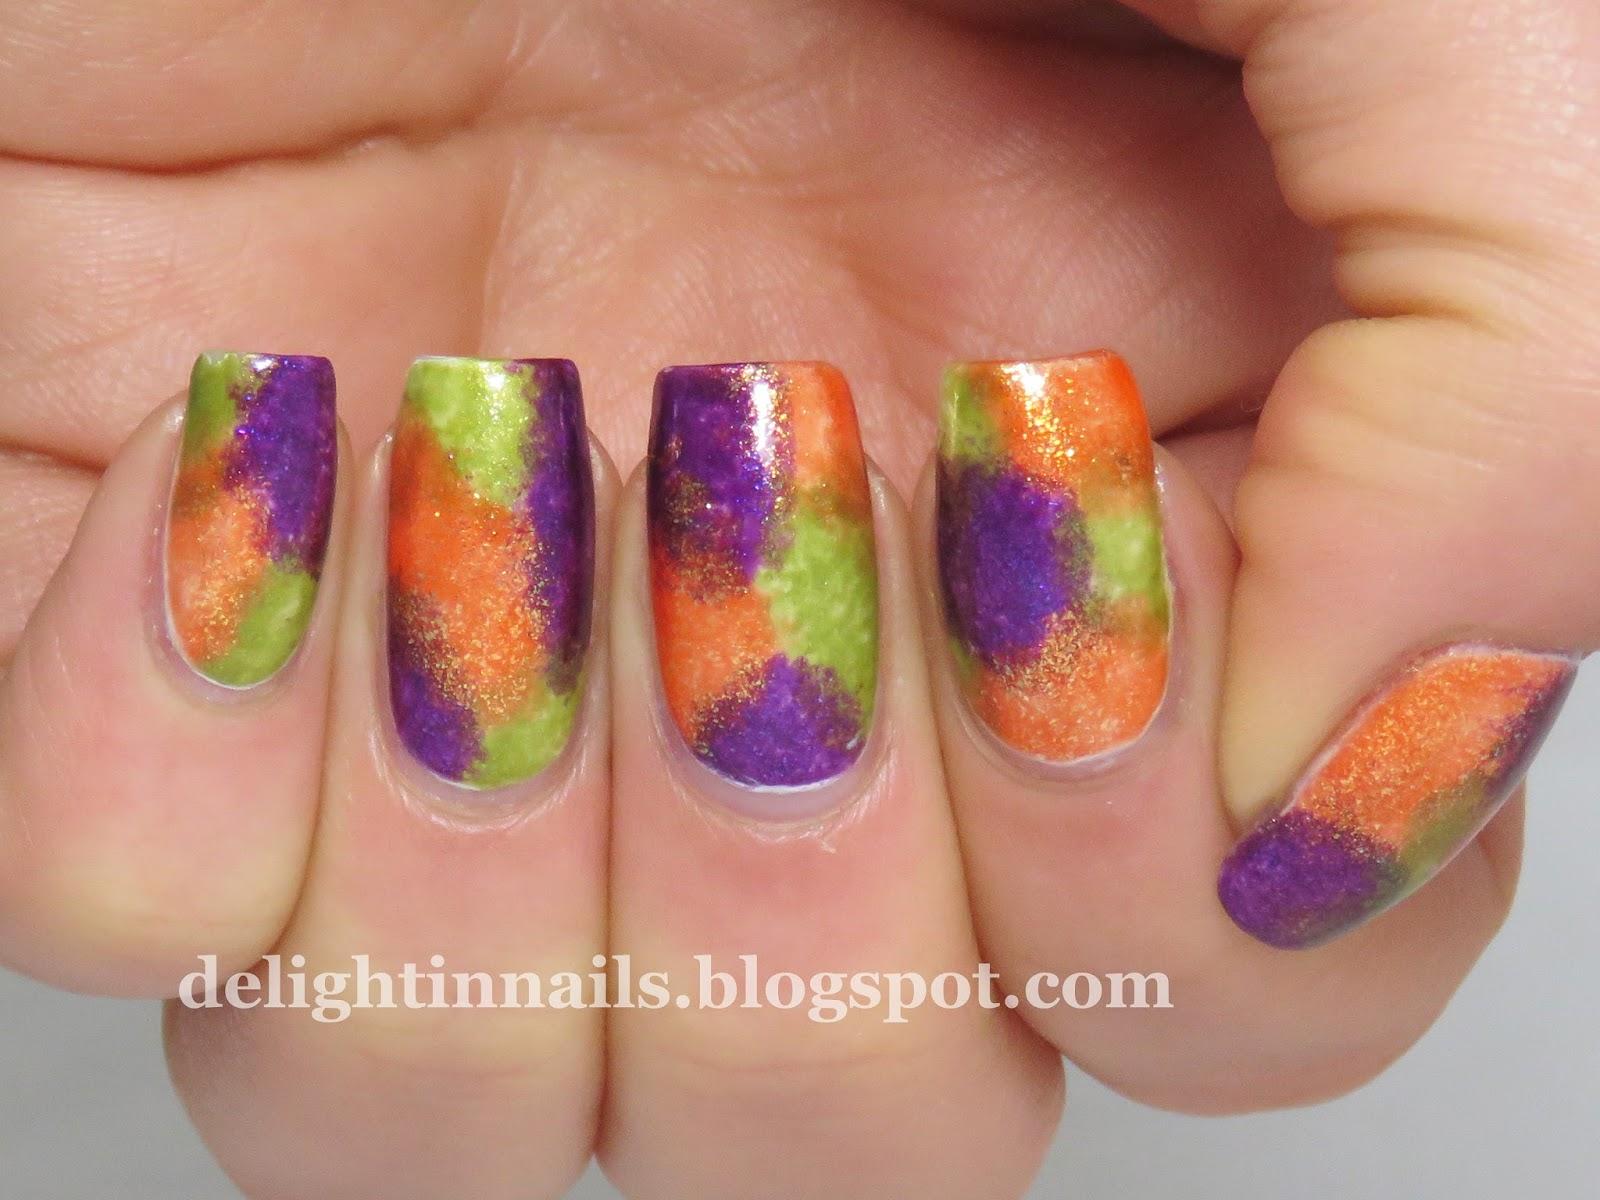 Delight In Nails: 40 Great Nail Art Ideas - Orange, Purple ...